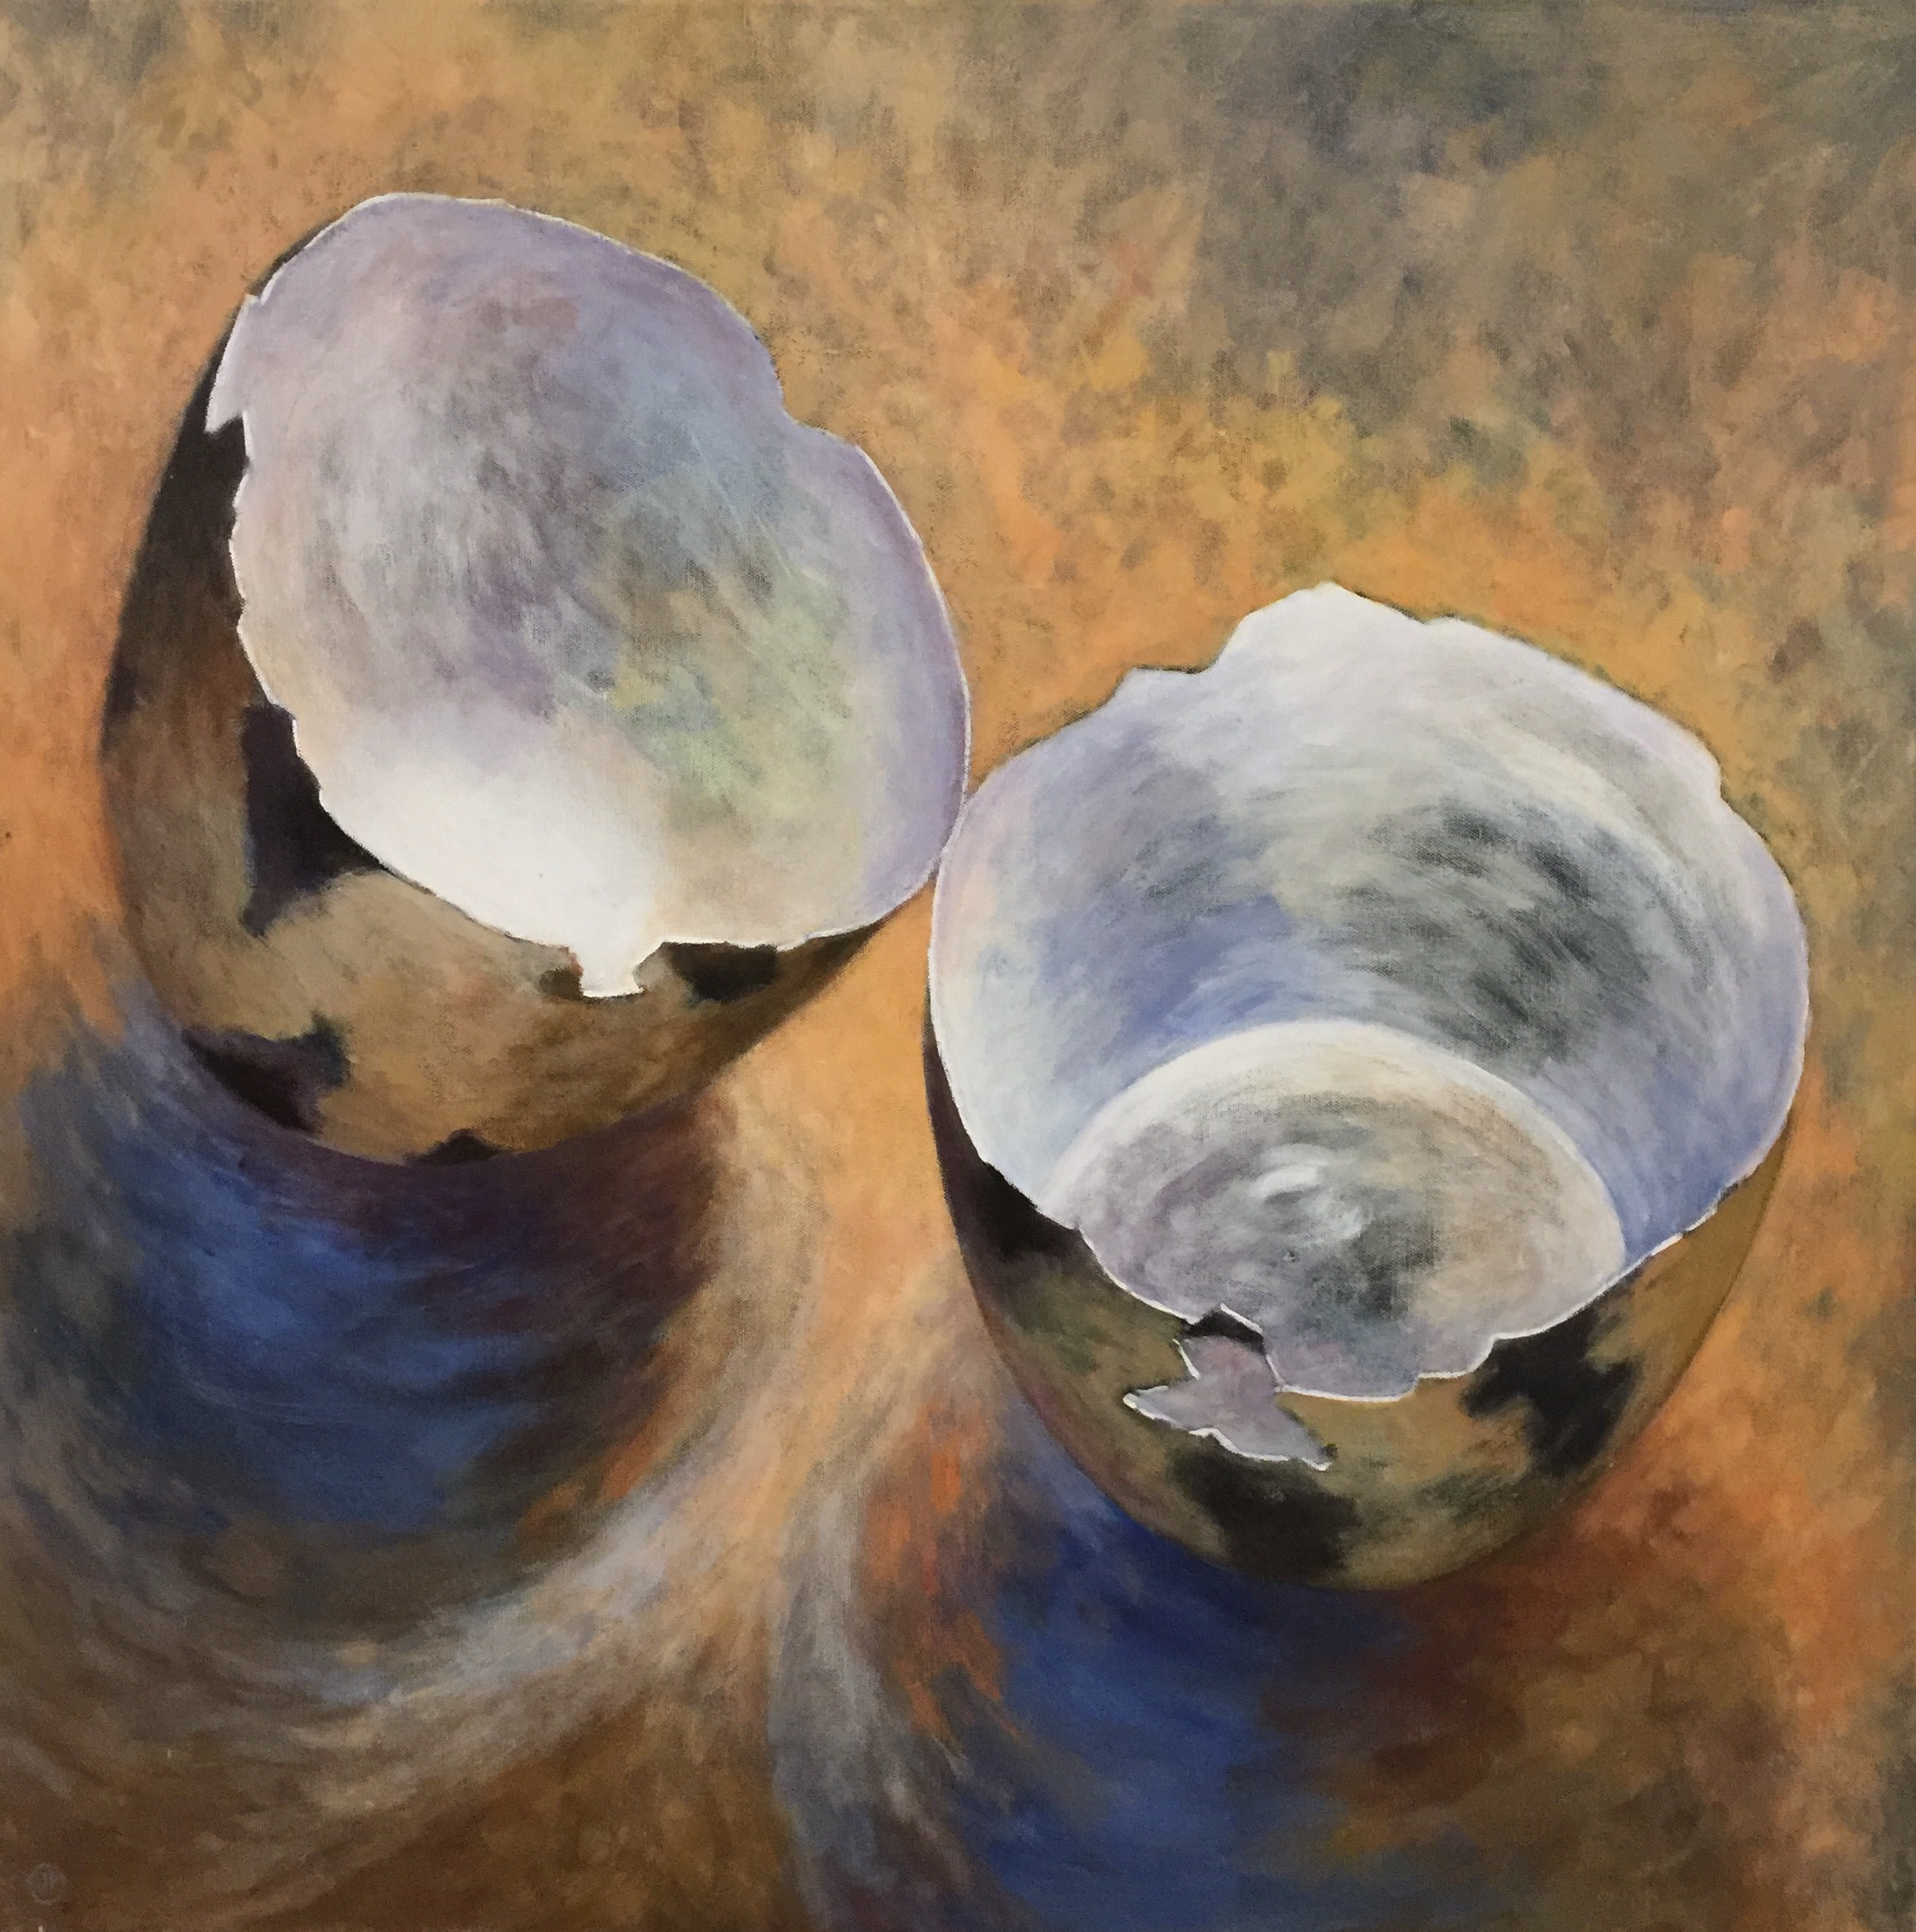 "<span class=""link fancybox-details-link""><a href=""/artists/34-joyce-pinch/works/1633-joyce-pinch-broken-quail-egg/"">View Detail Page</a></span><div class=""artist""><strong>Joyce Pinch</strong></div> <div class=""title""><em>Broken Quail Egg</em></div> <div class=""medium"">Acrylic on Canvas</div> <div class=""dimensions"">76 x 76 cm</div><div class=""copyright_line"">Copyright The Artist</div>"